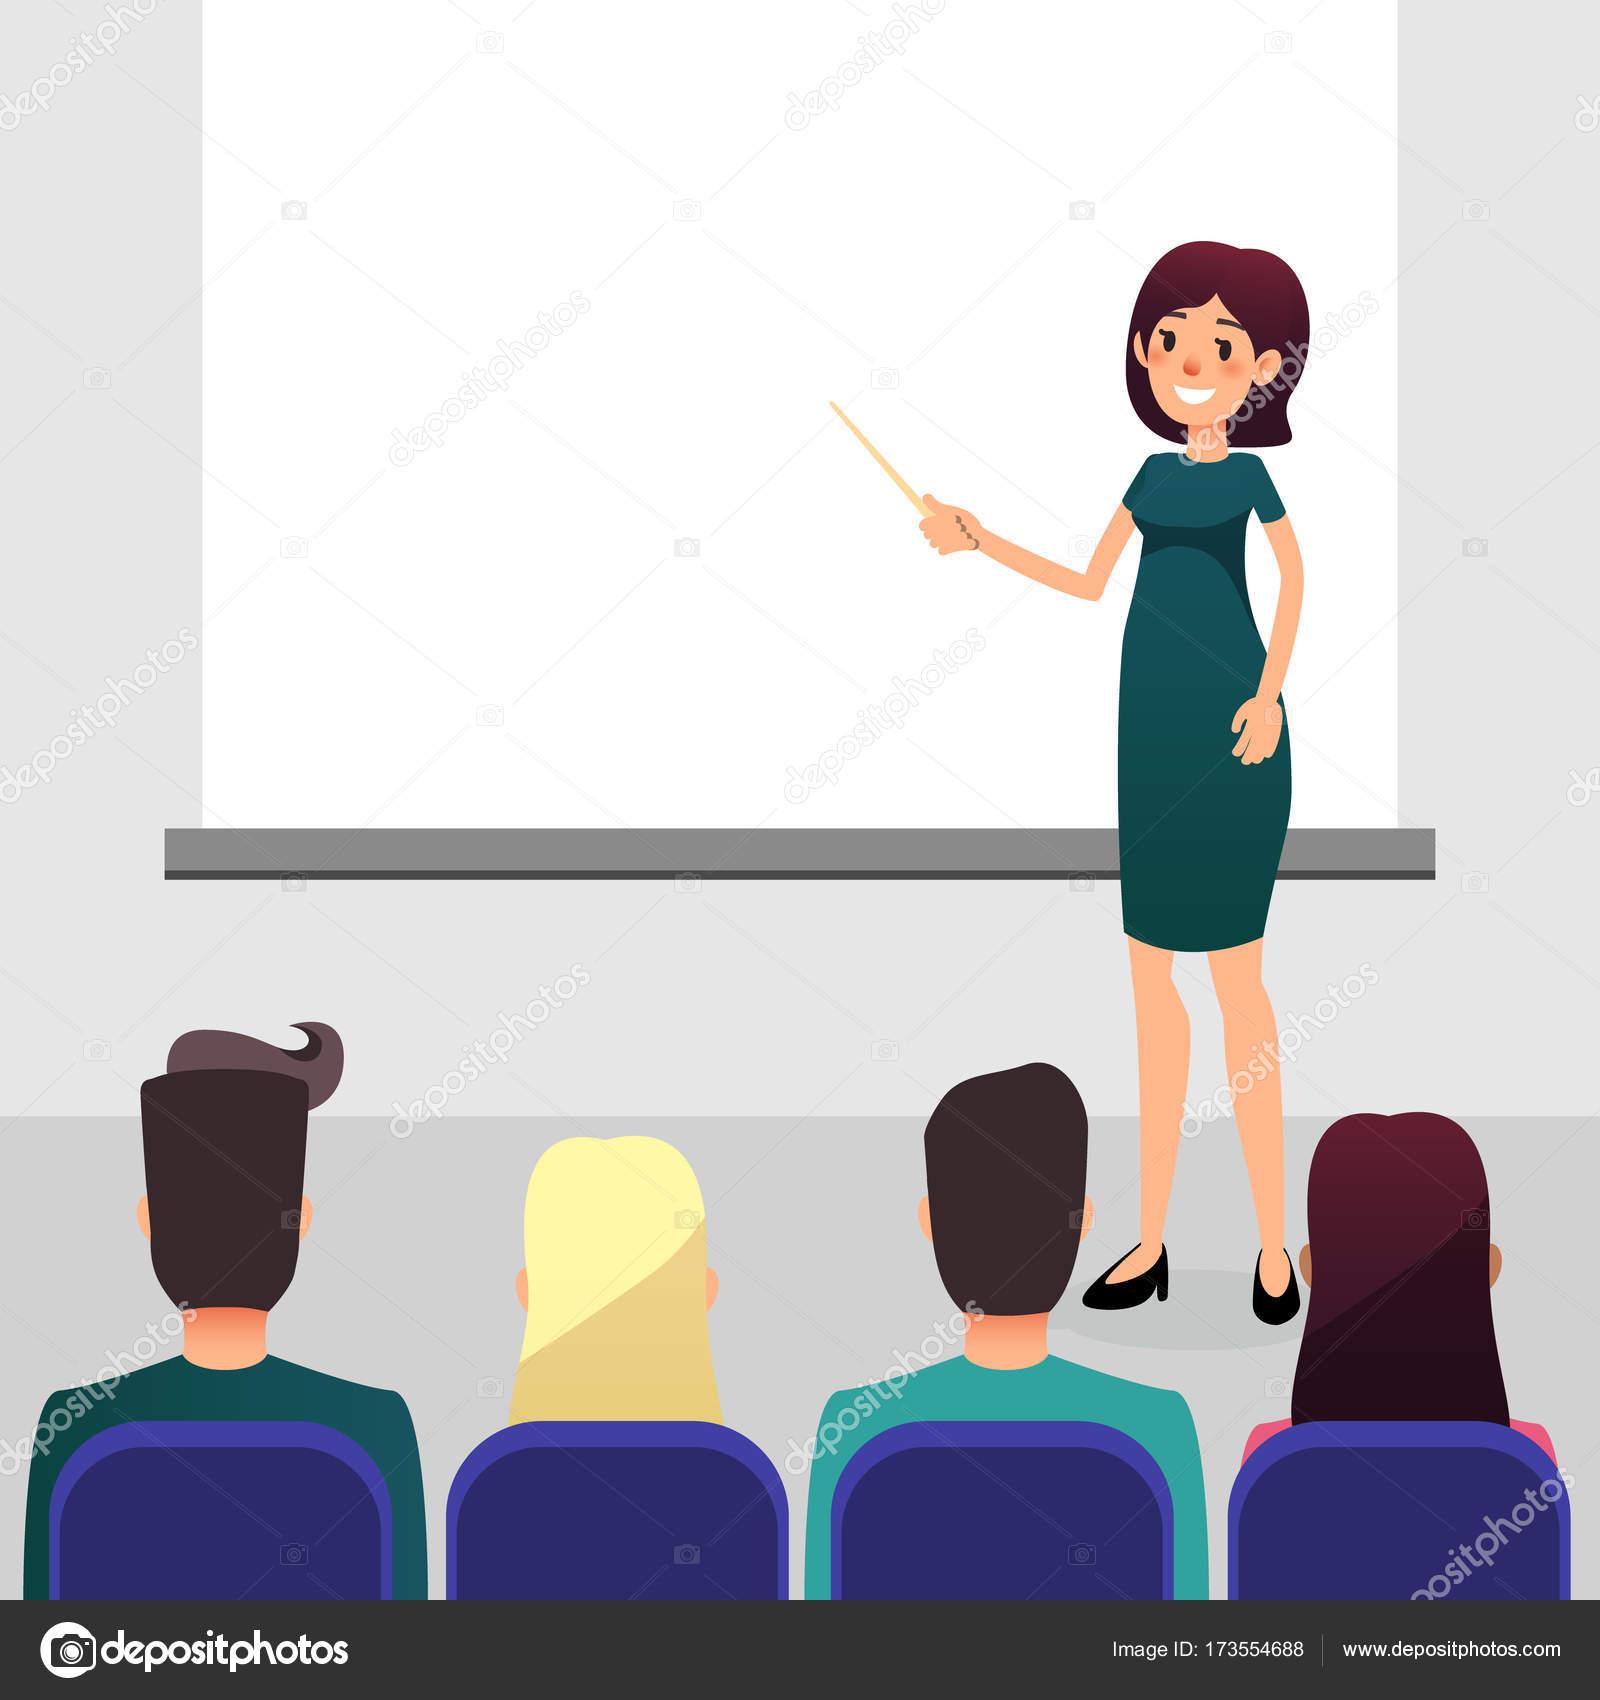 depositphotos_173554688-stock-illustration-cartoon-flat-women-with-pointer.jpg